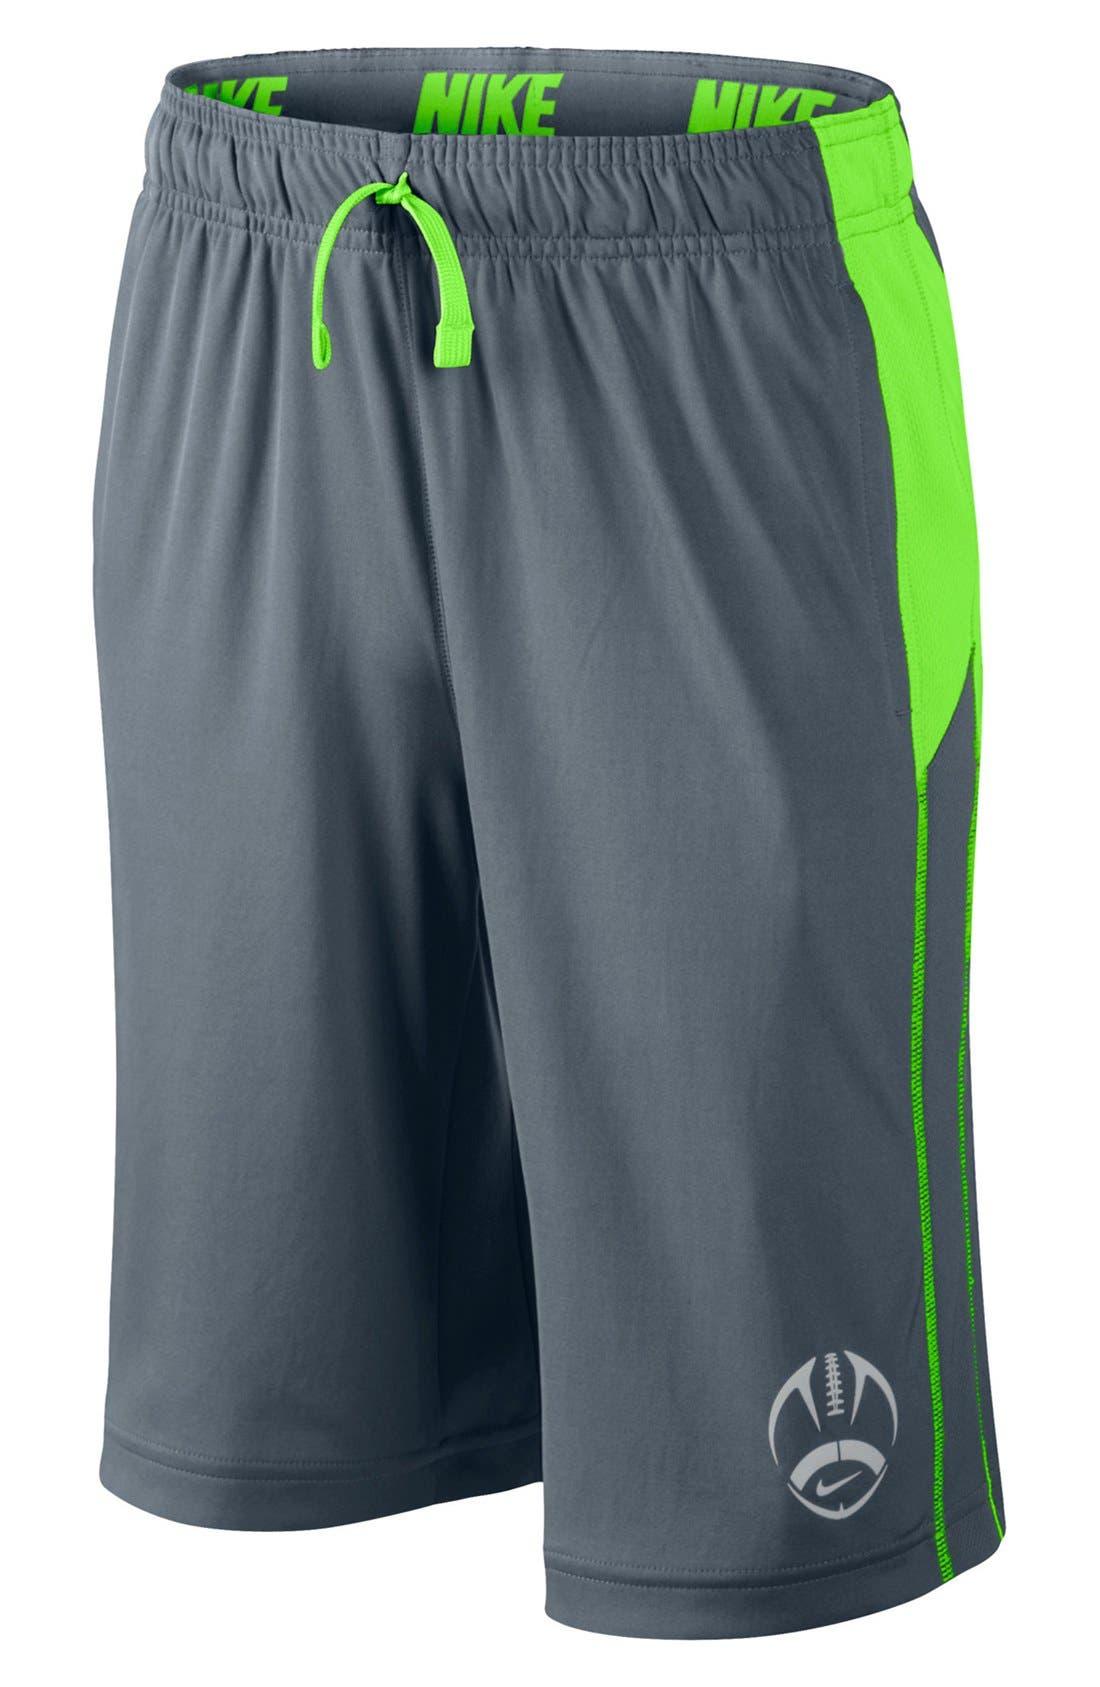 Alternate Image 1 Selected - Nike 'Field Sport' Shorts (Big Boys)